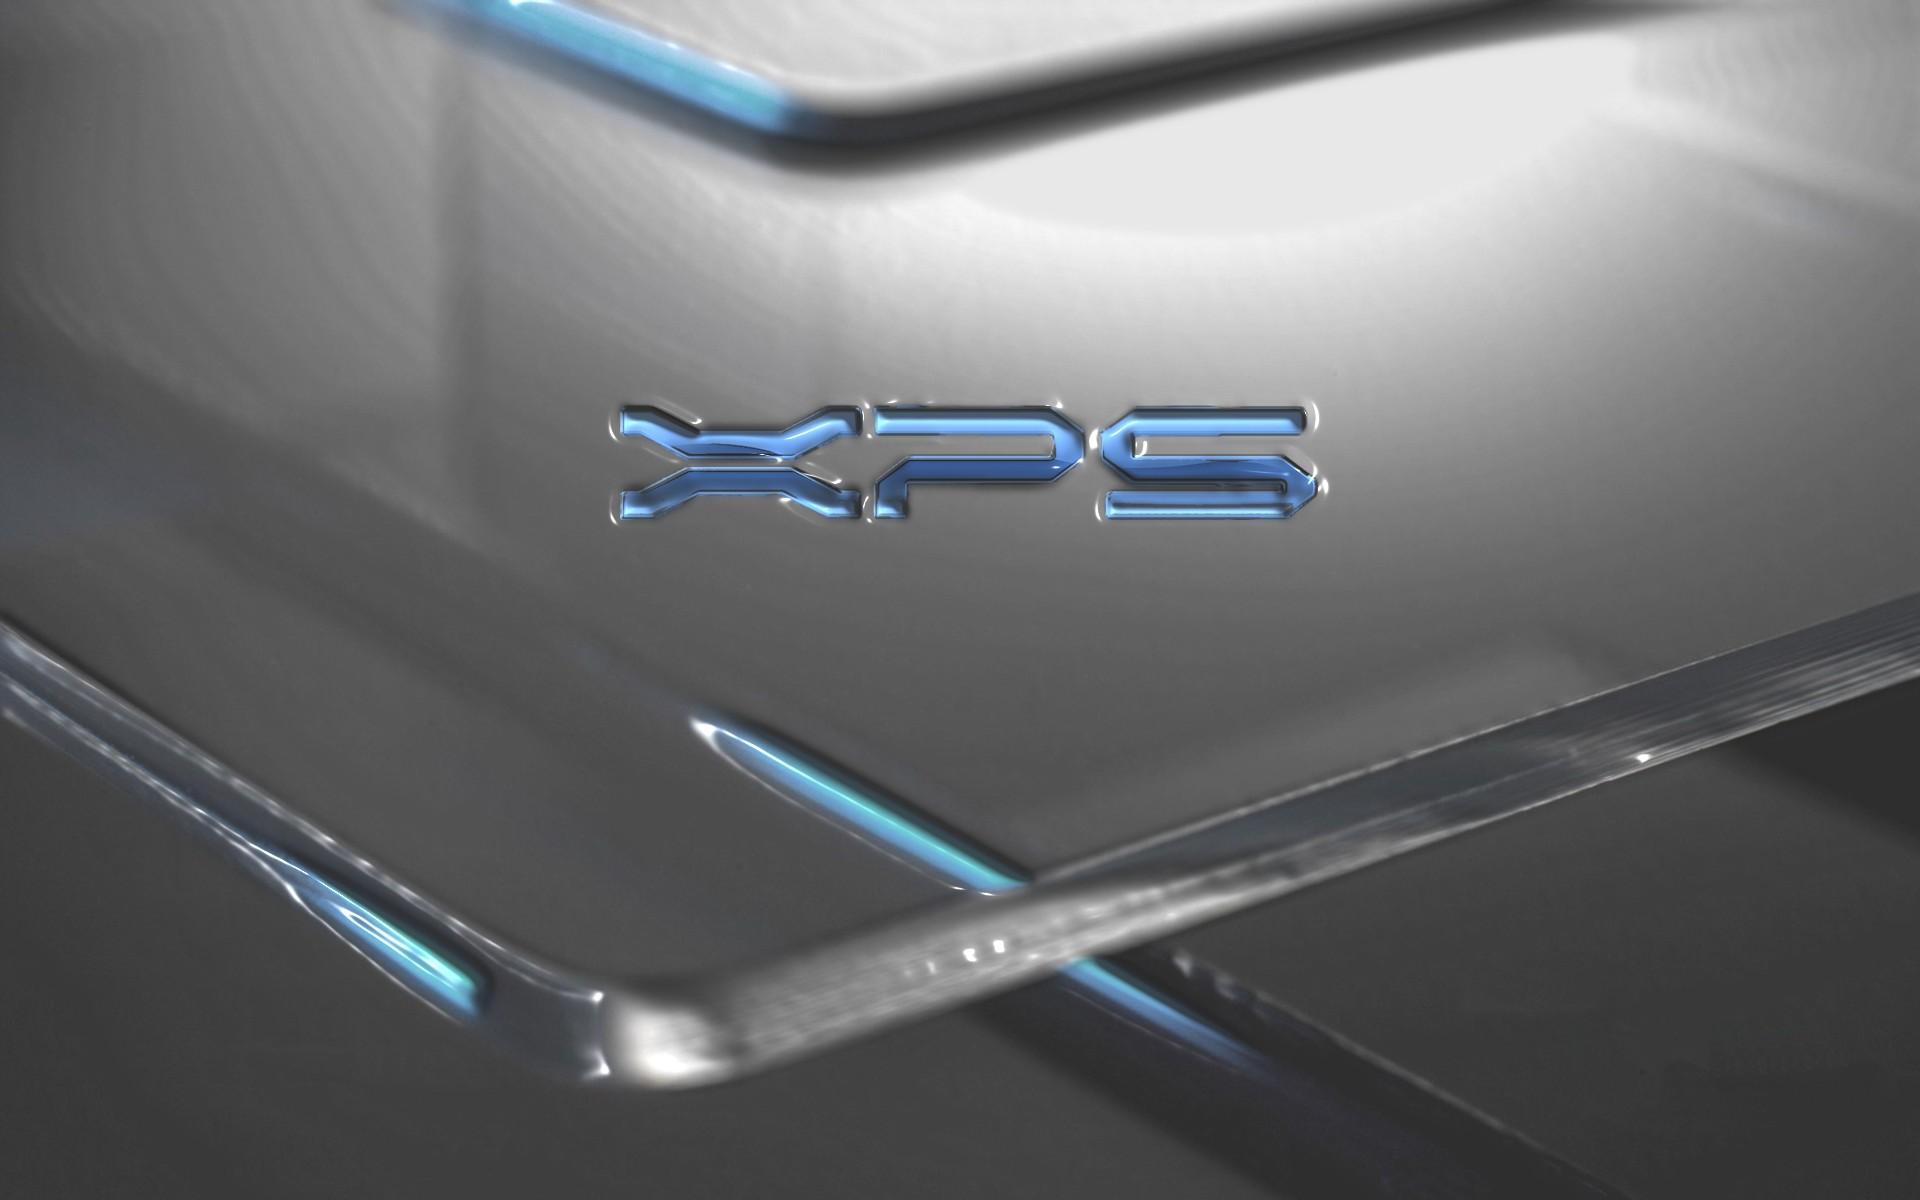 Dell XPS Wallpaper 1920×1080, Dell XPS 1920×1080 High .